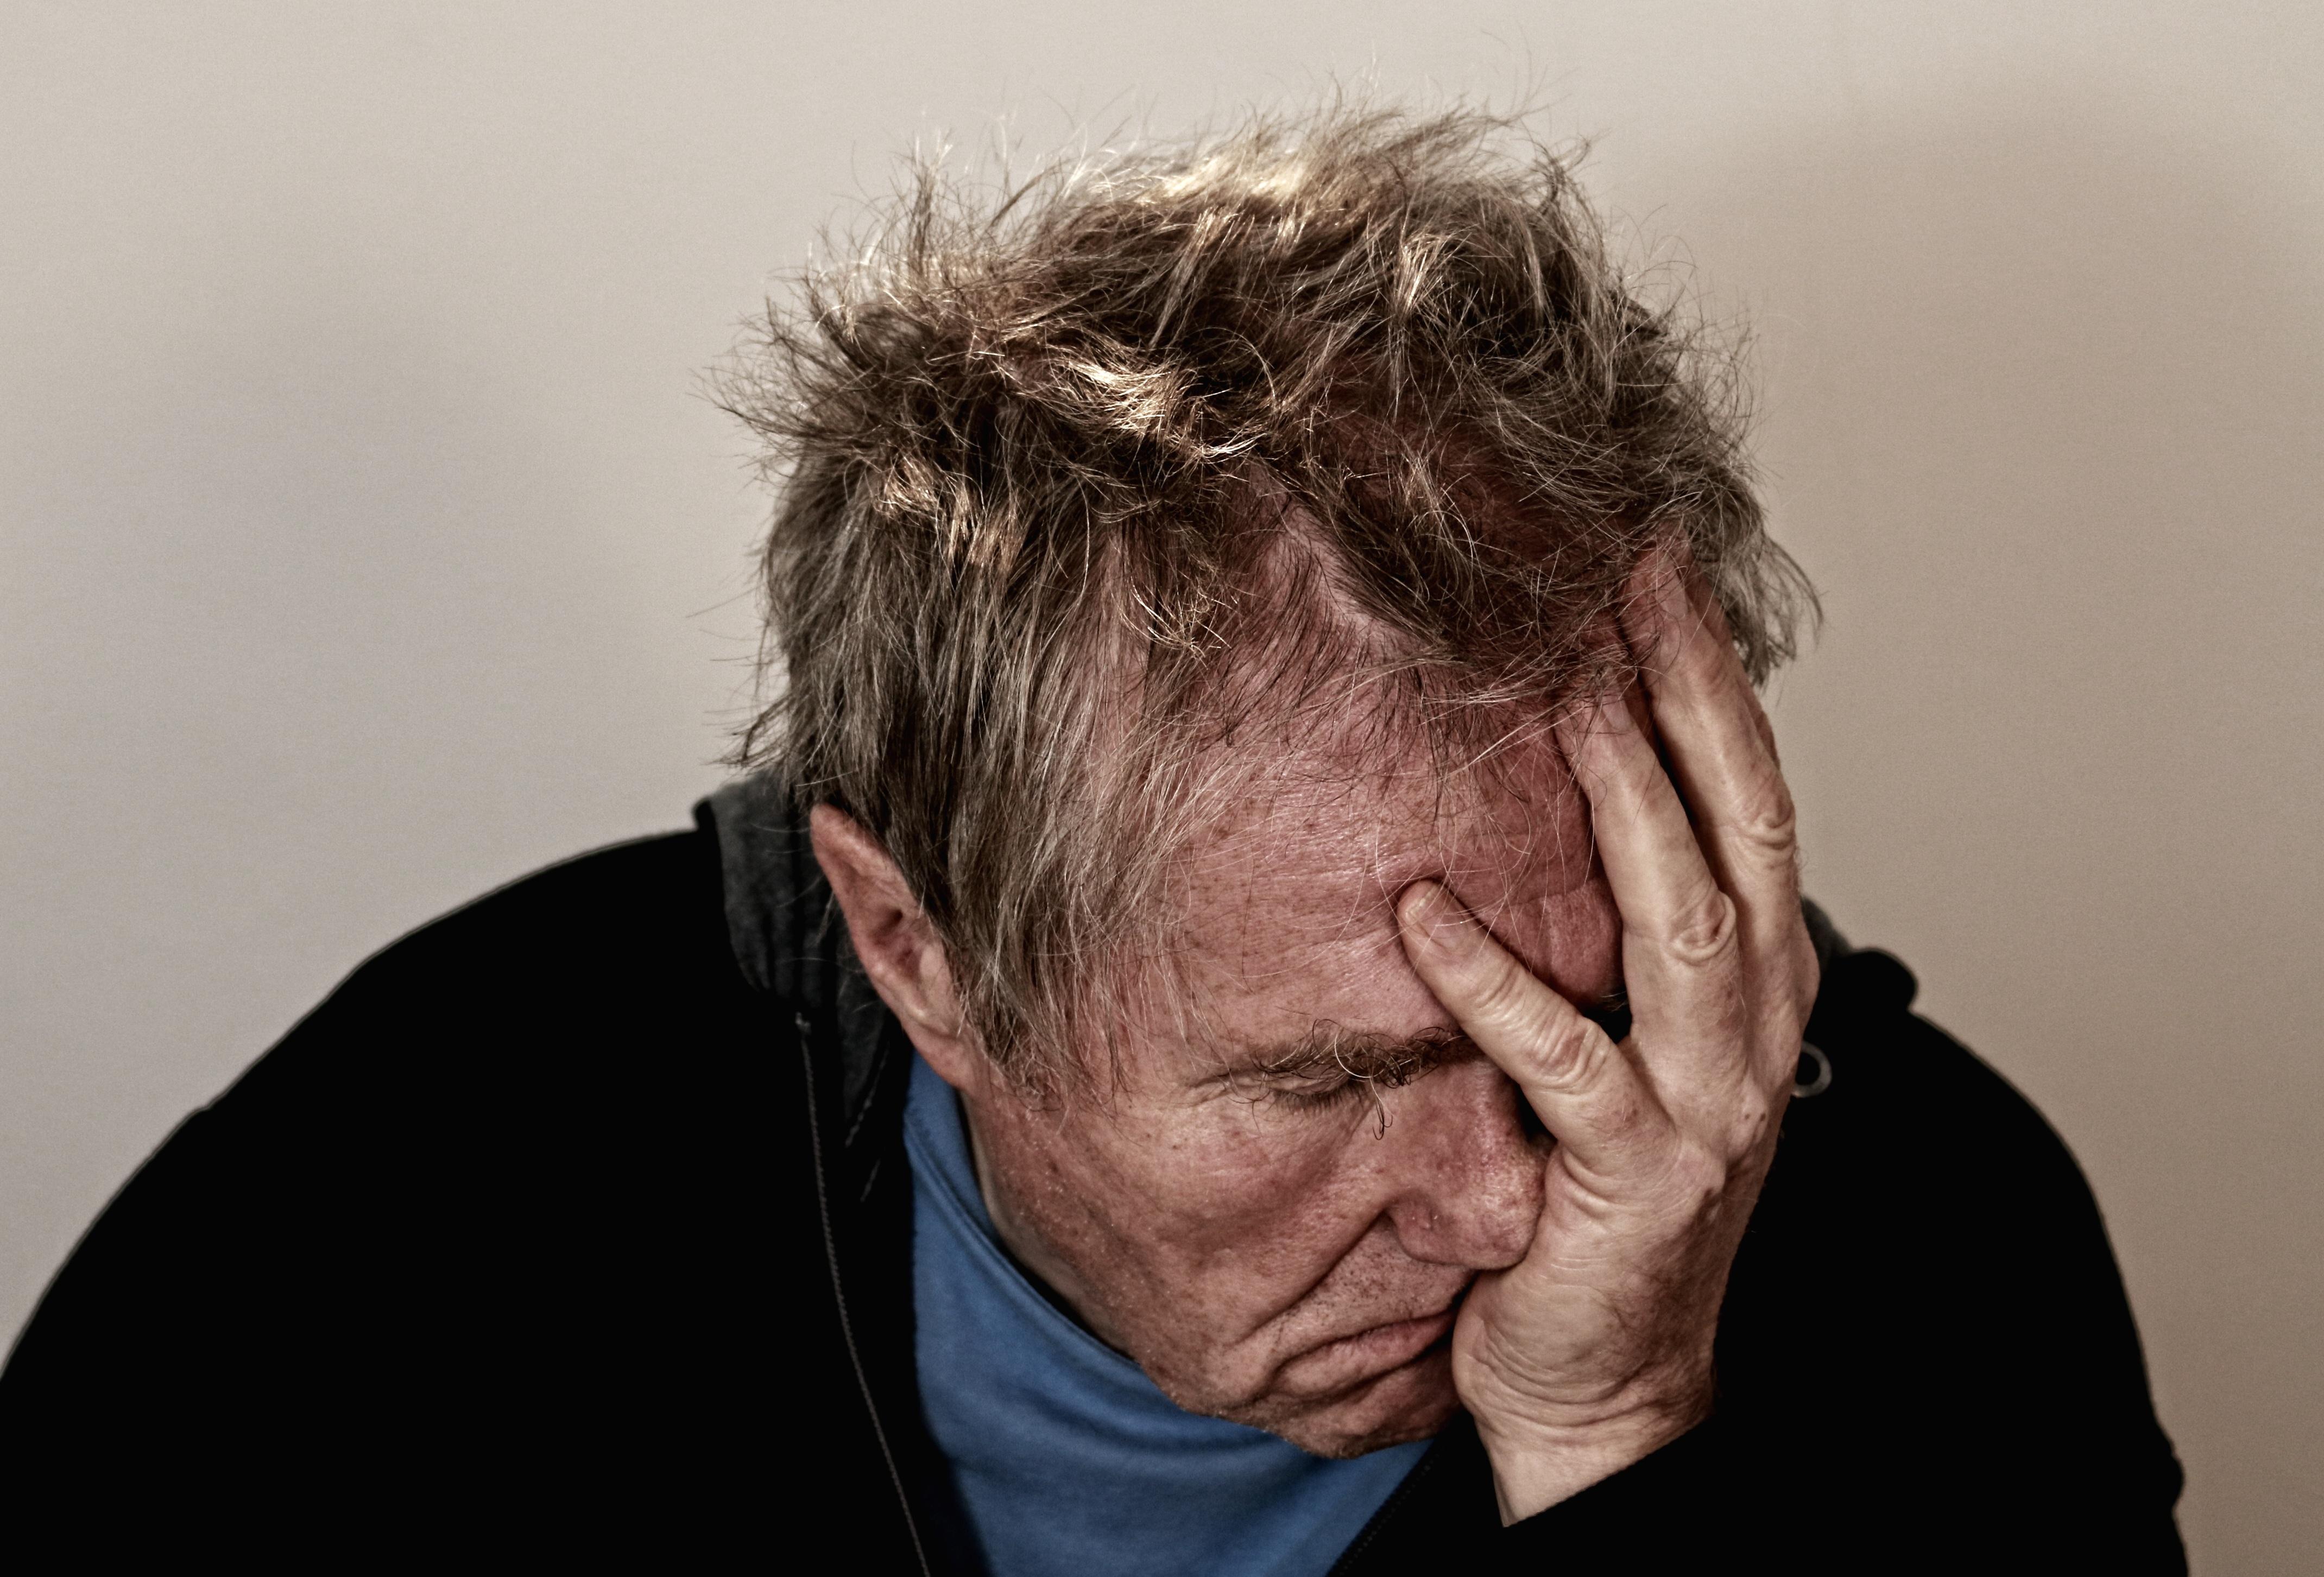 Dolor Facial Mandibular Craneal Cervical Una Epidemia